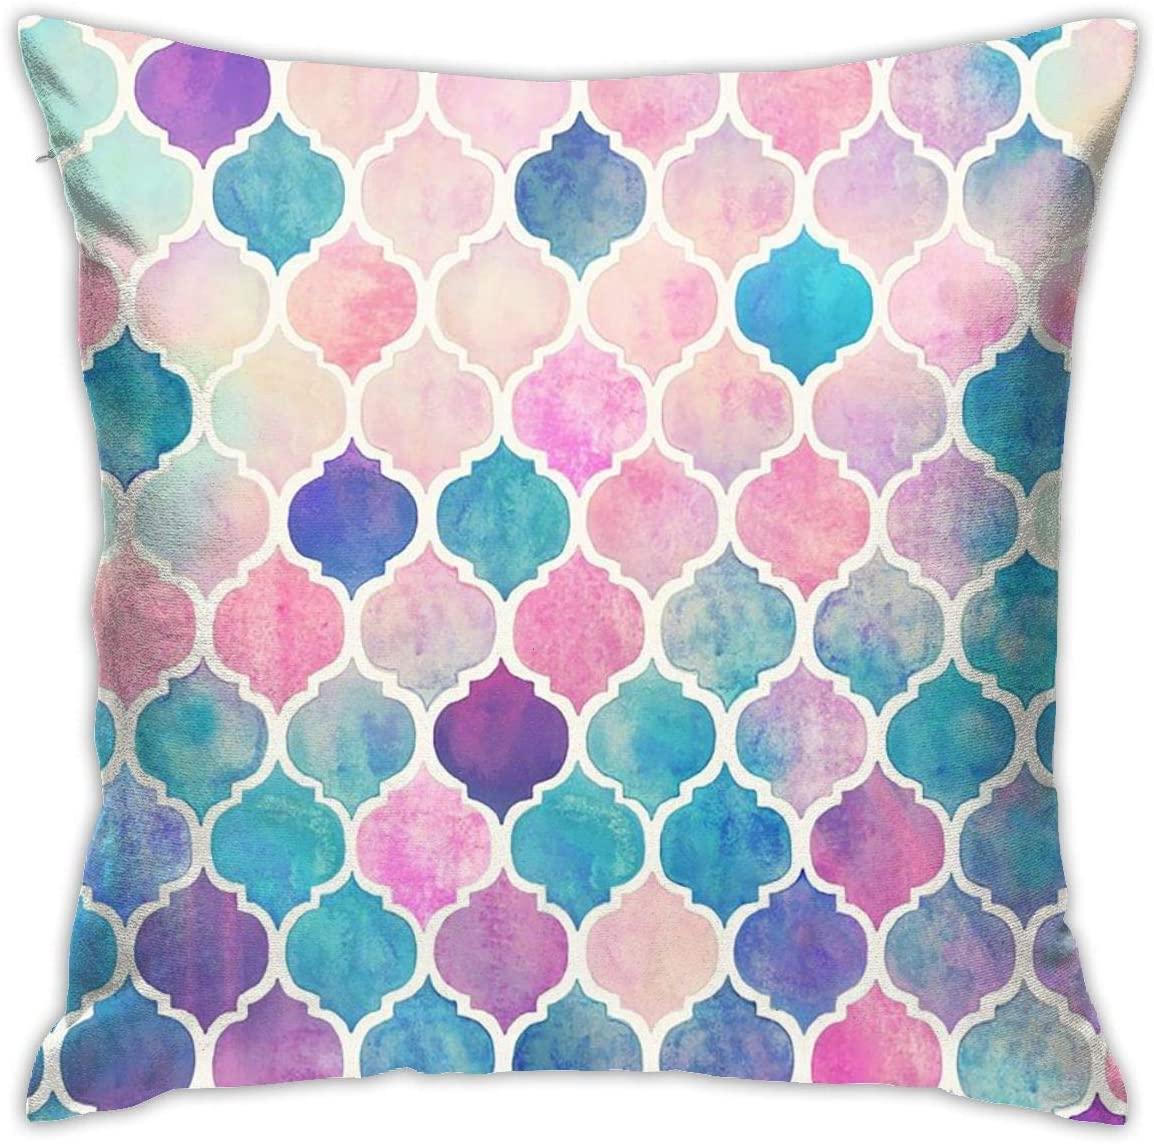 Colorful Geometric Trellis Chain Throw Pillow Cover 18X18, Double Side Design Bolster Pillowcase, Decorative Cushion Pillow Case for Car Sofa Theme Brithday Party Bedroom Decor Kid Girls Boys